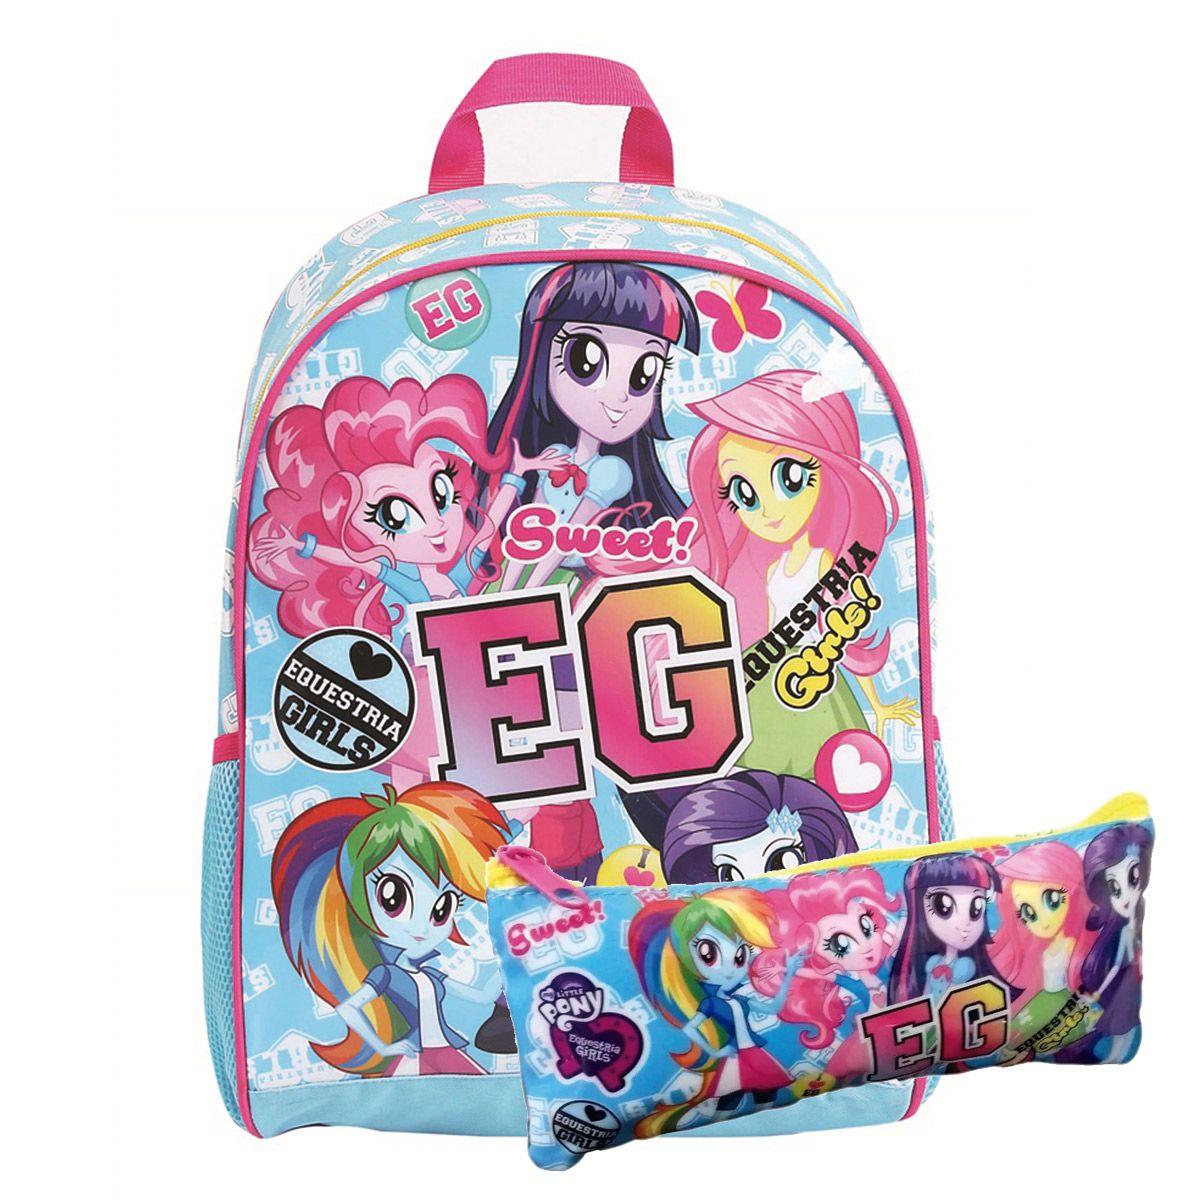 Kit Mochila G My Little Pony Equestria Girls C/ estojo Oficial